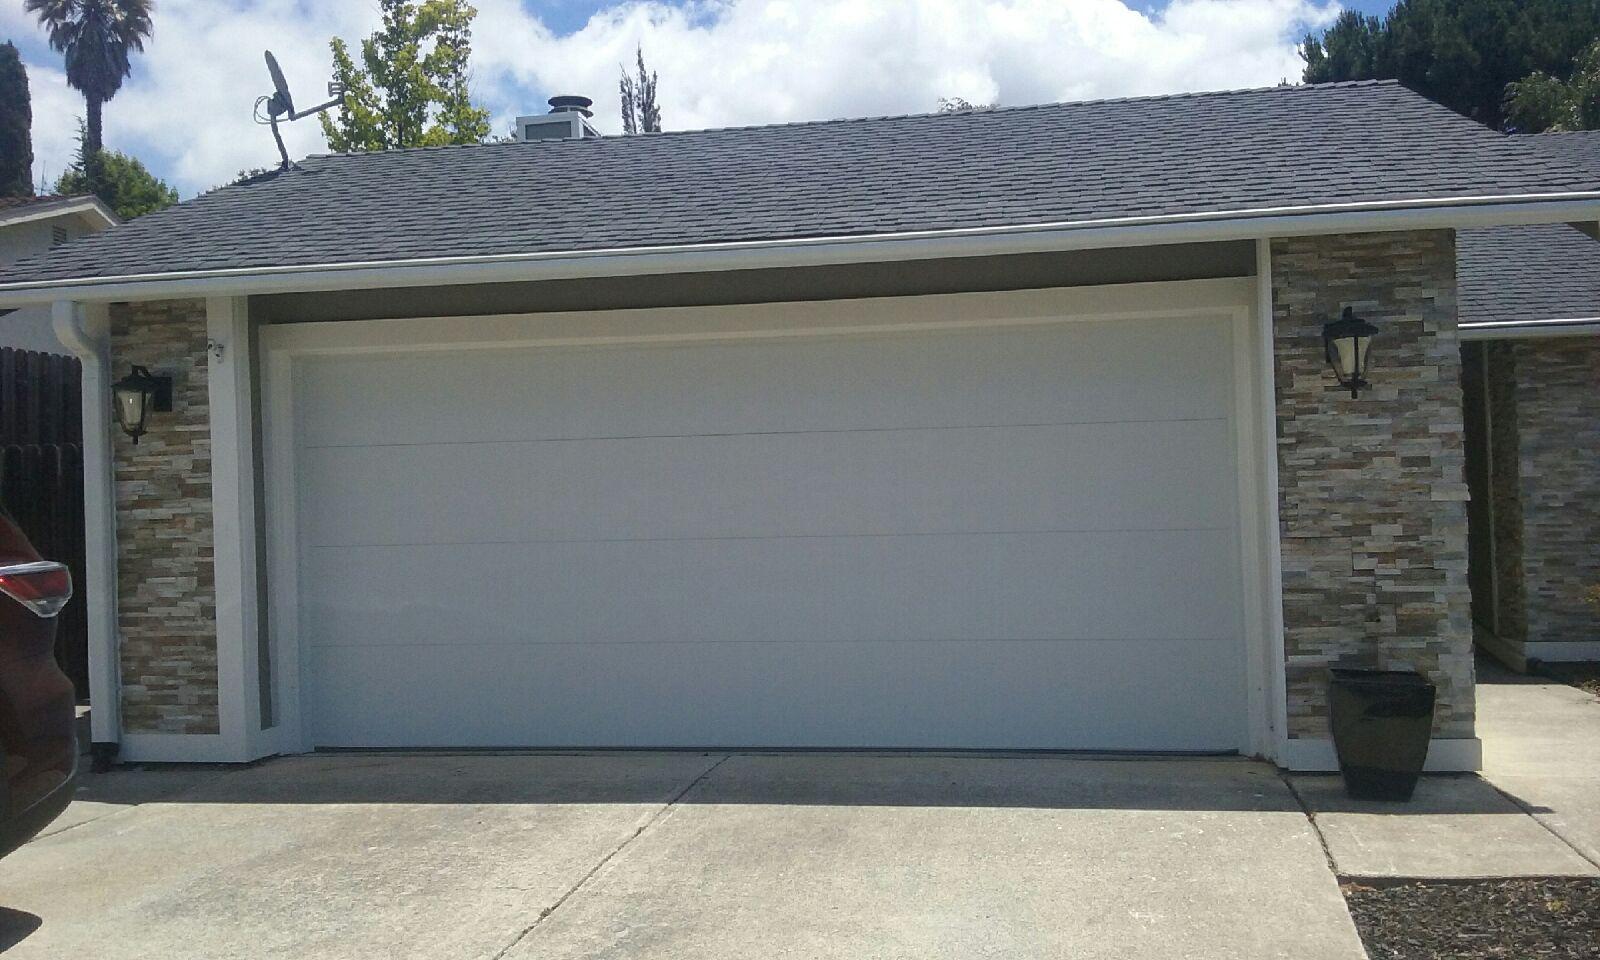 All Bay Garage Doors - Flush Panel Garage Doors - Kevin Chervatin - 54.JPG